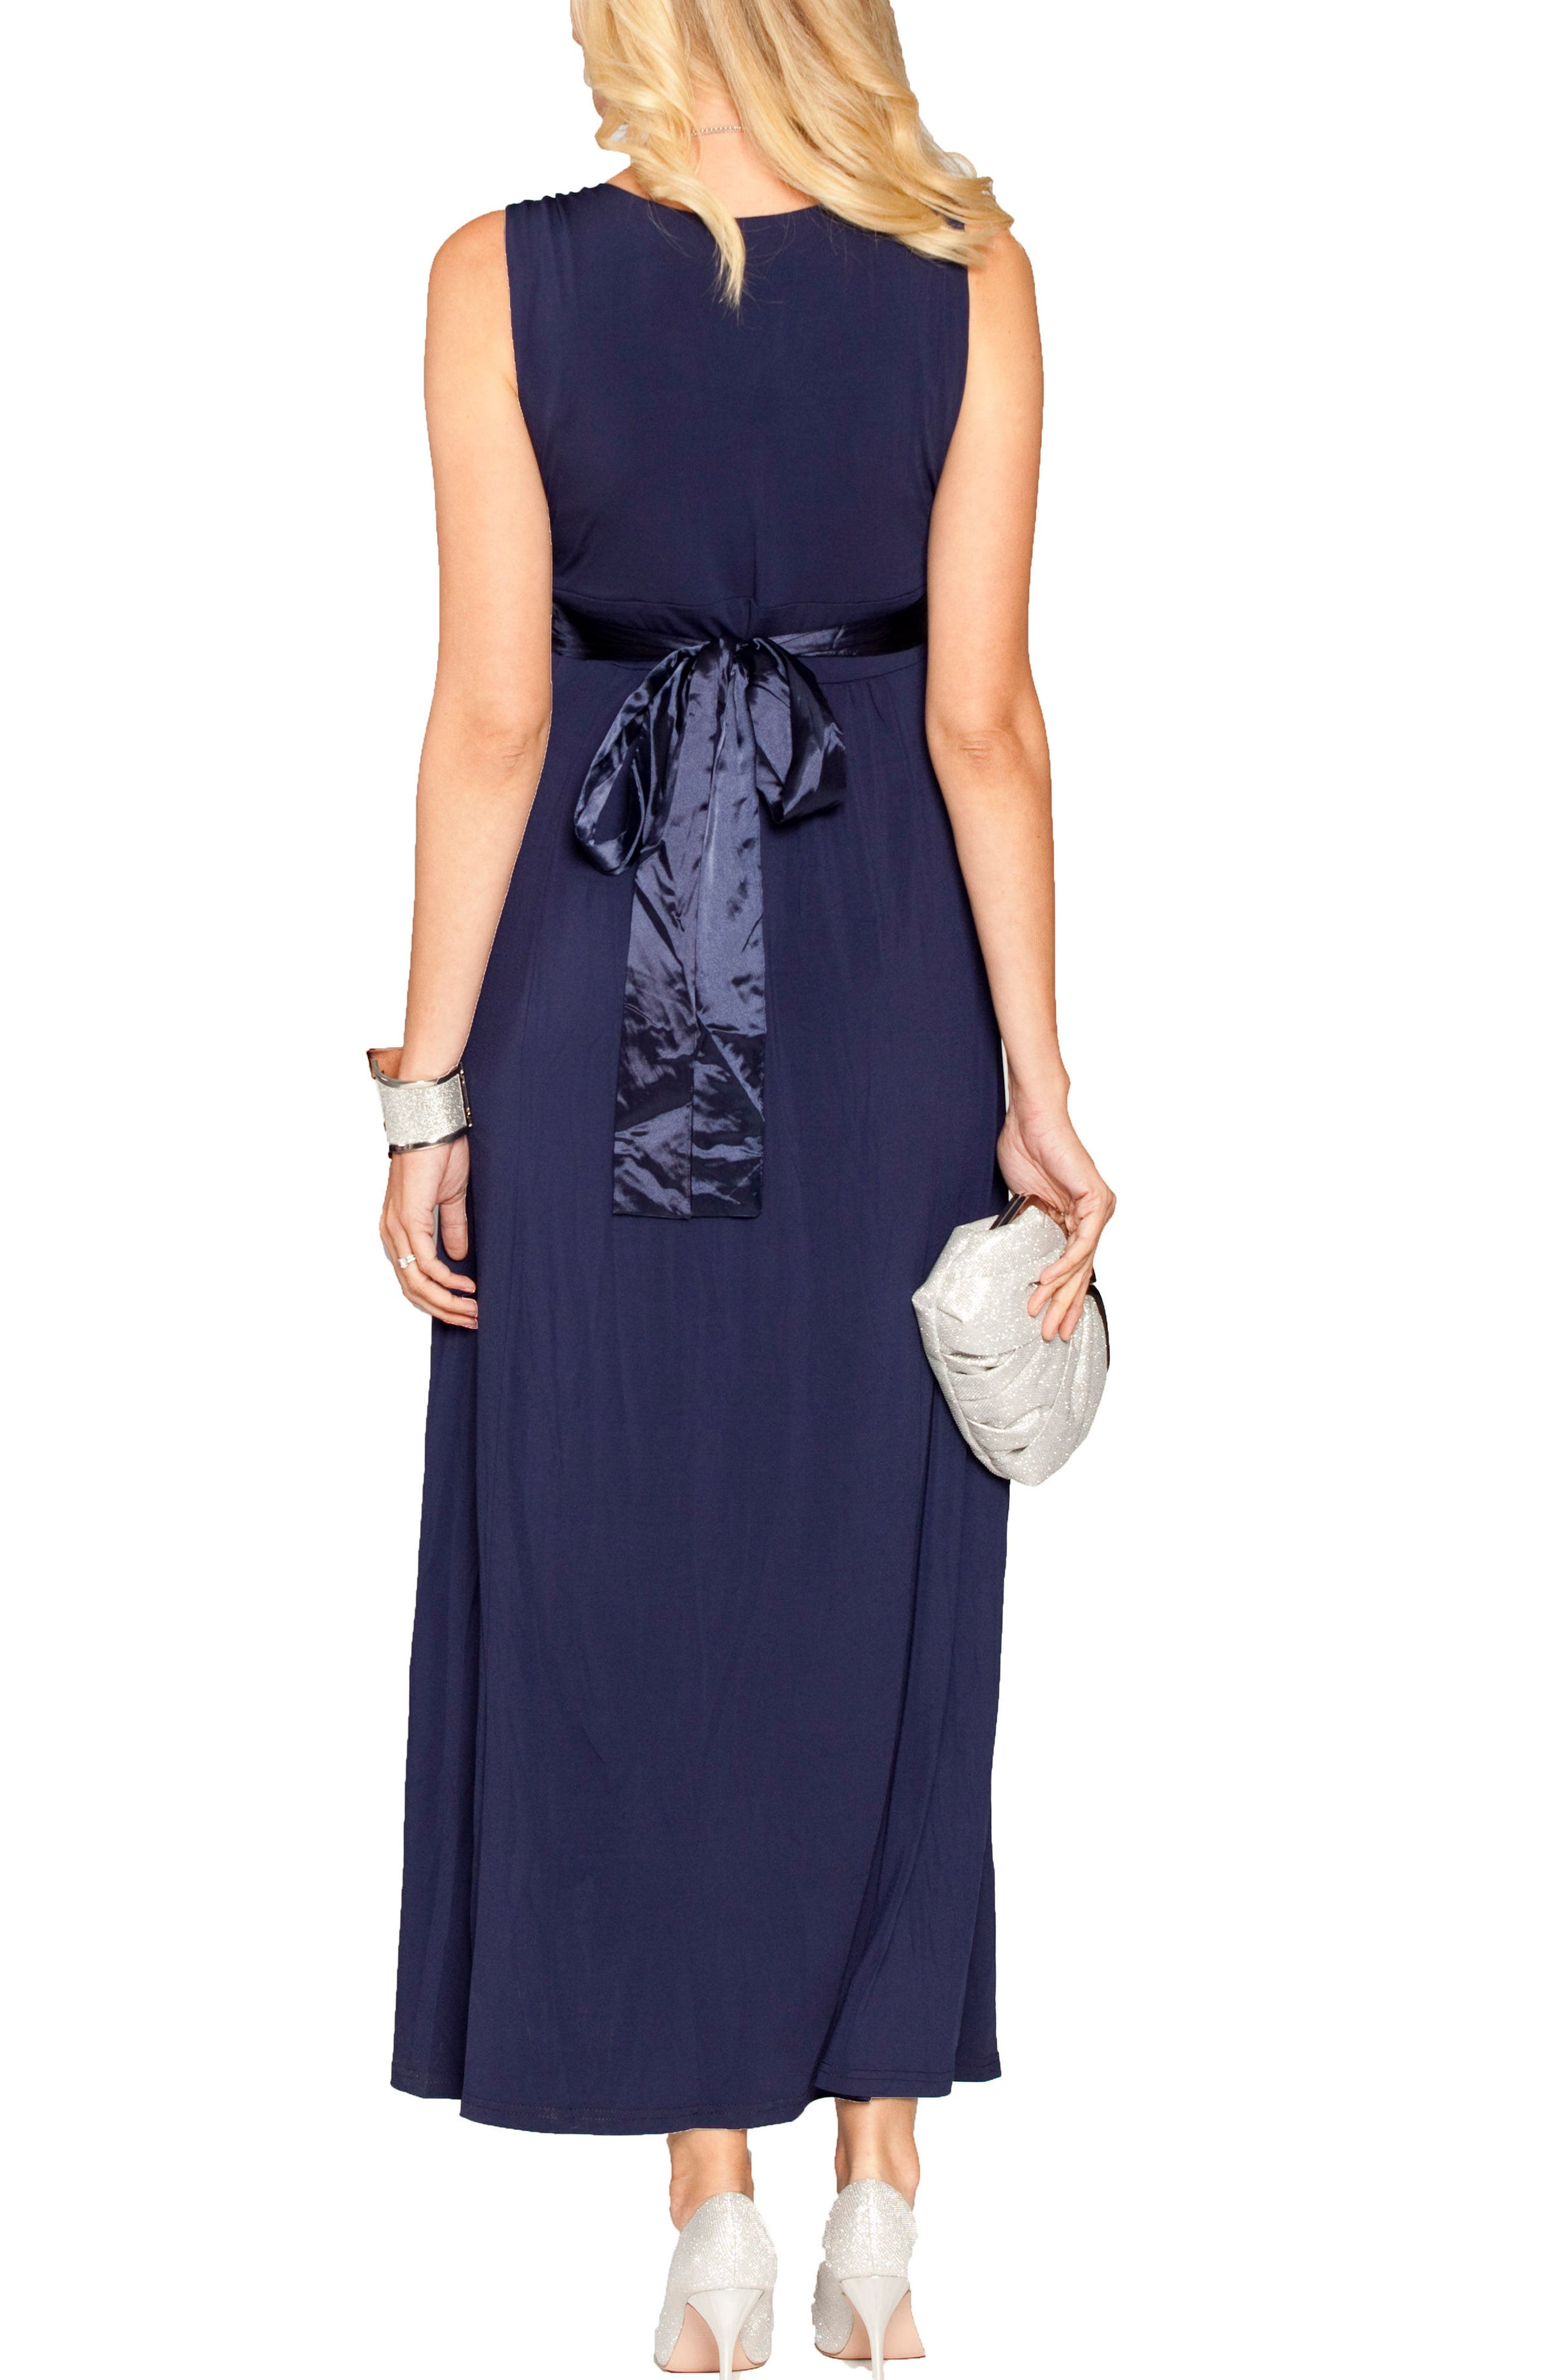 Satin Trim Maternity Dress,                             Alternate thumbnail 2, color,                             Dark Navy